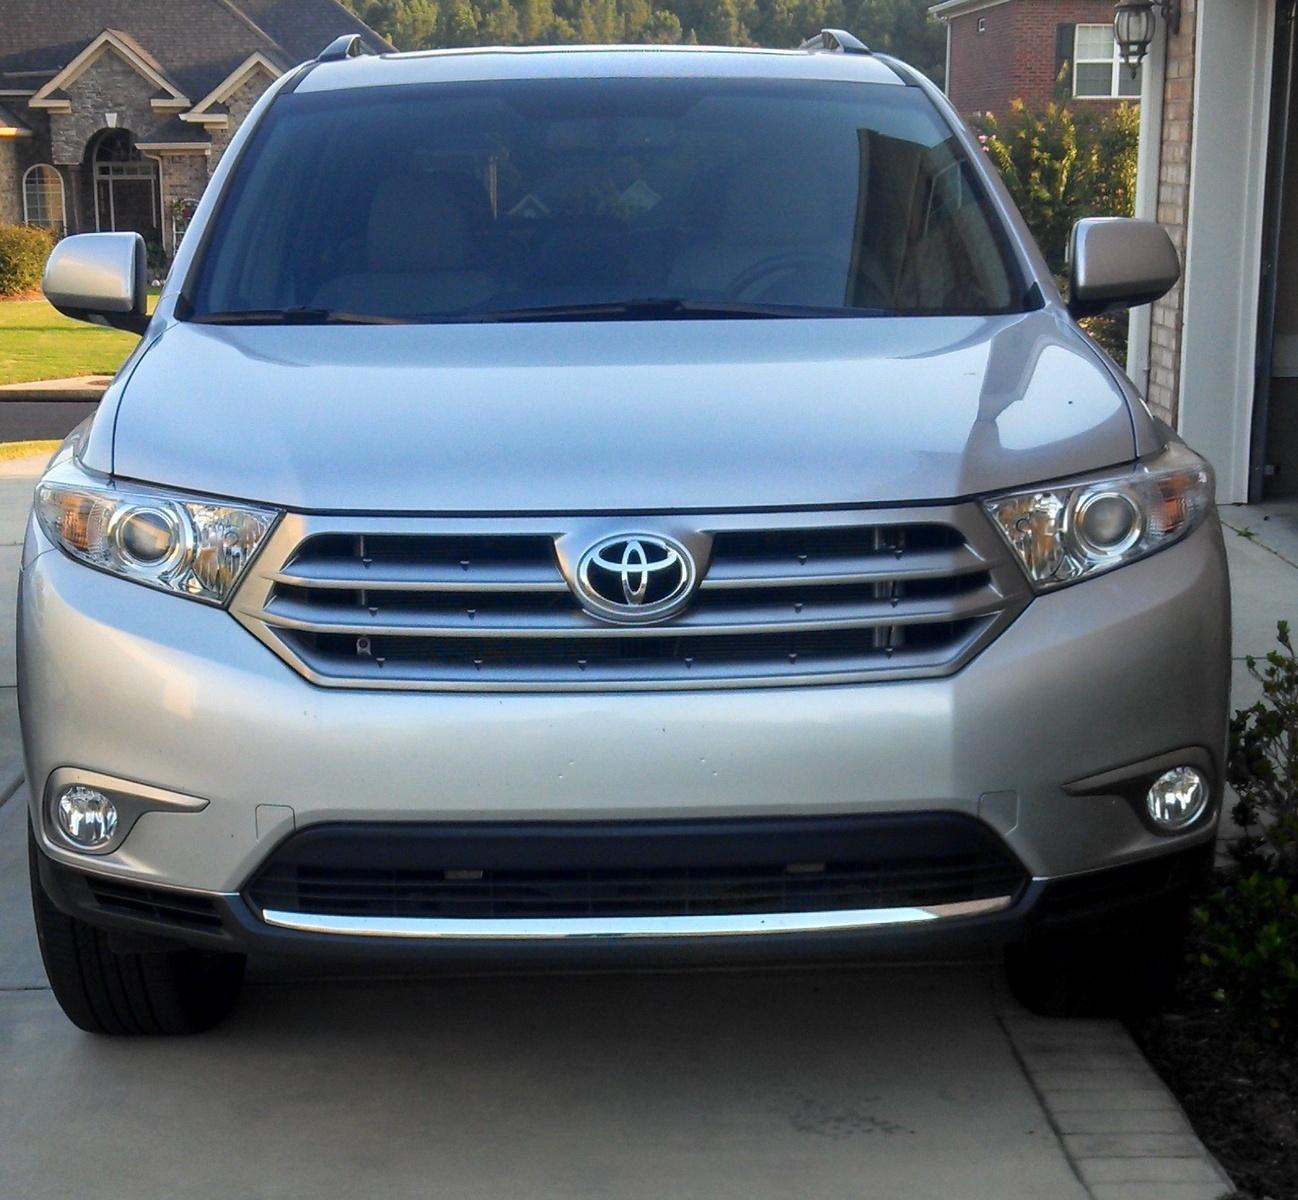 2012 Toyota Highlander Limited: 2013 Toyota Highlander